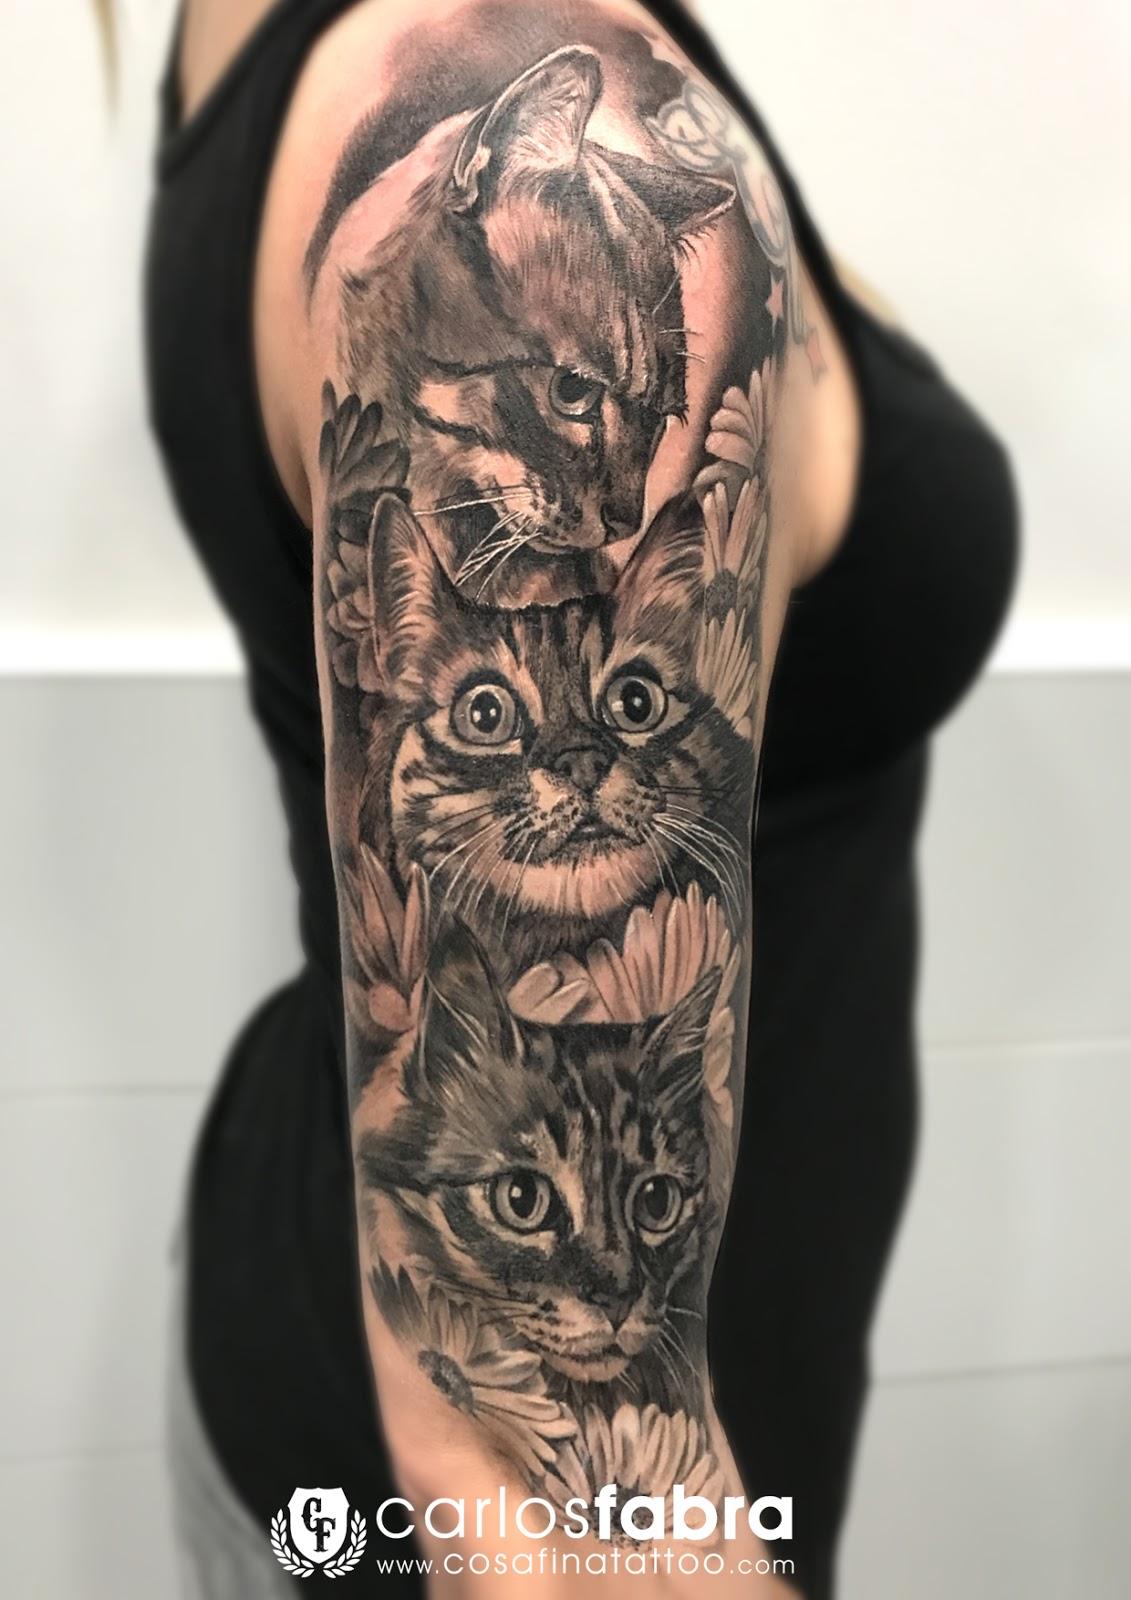 Cosafina Tattoo Carlos Art Studio Tatuaje Brazo Animales Mascotas